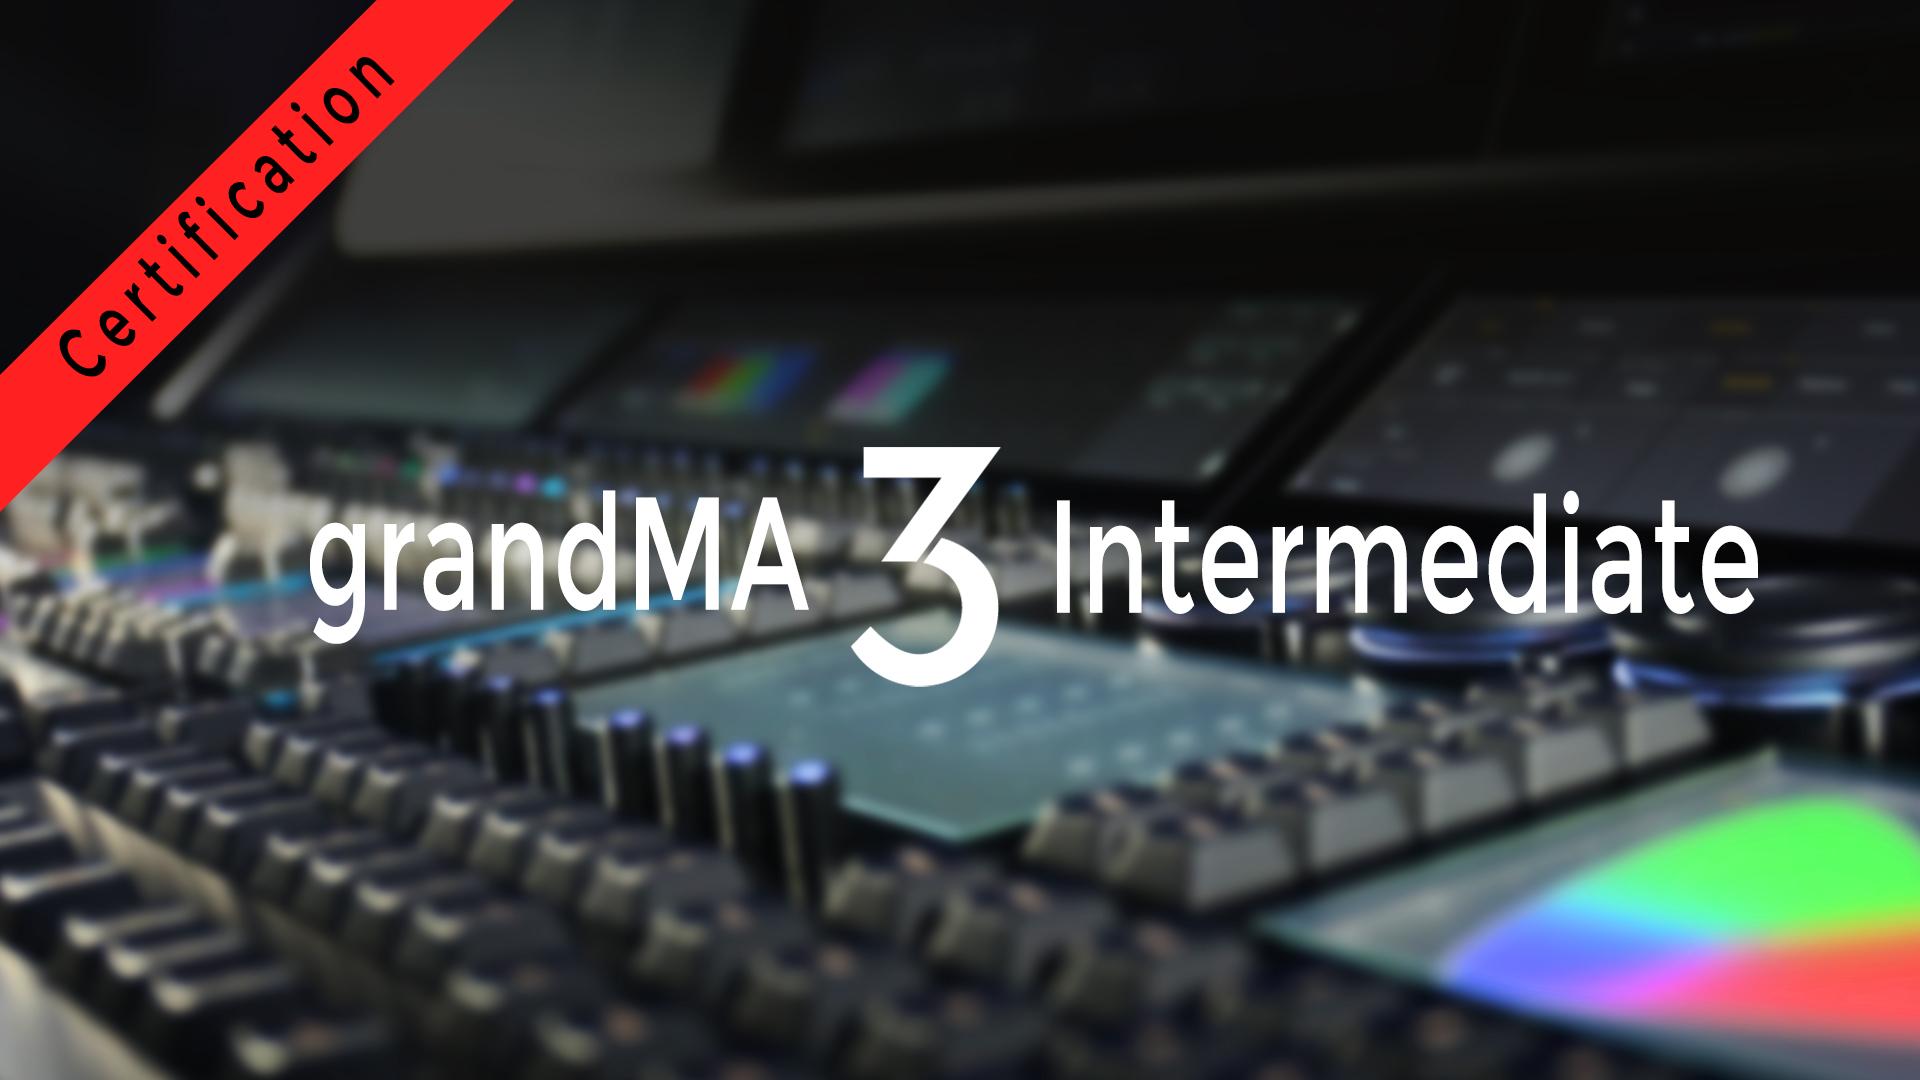 grandMA3 Pro Intermediate